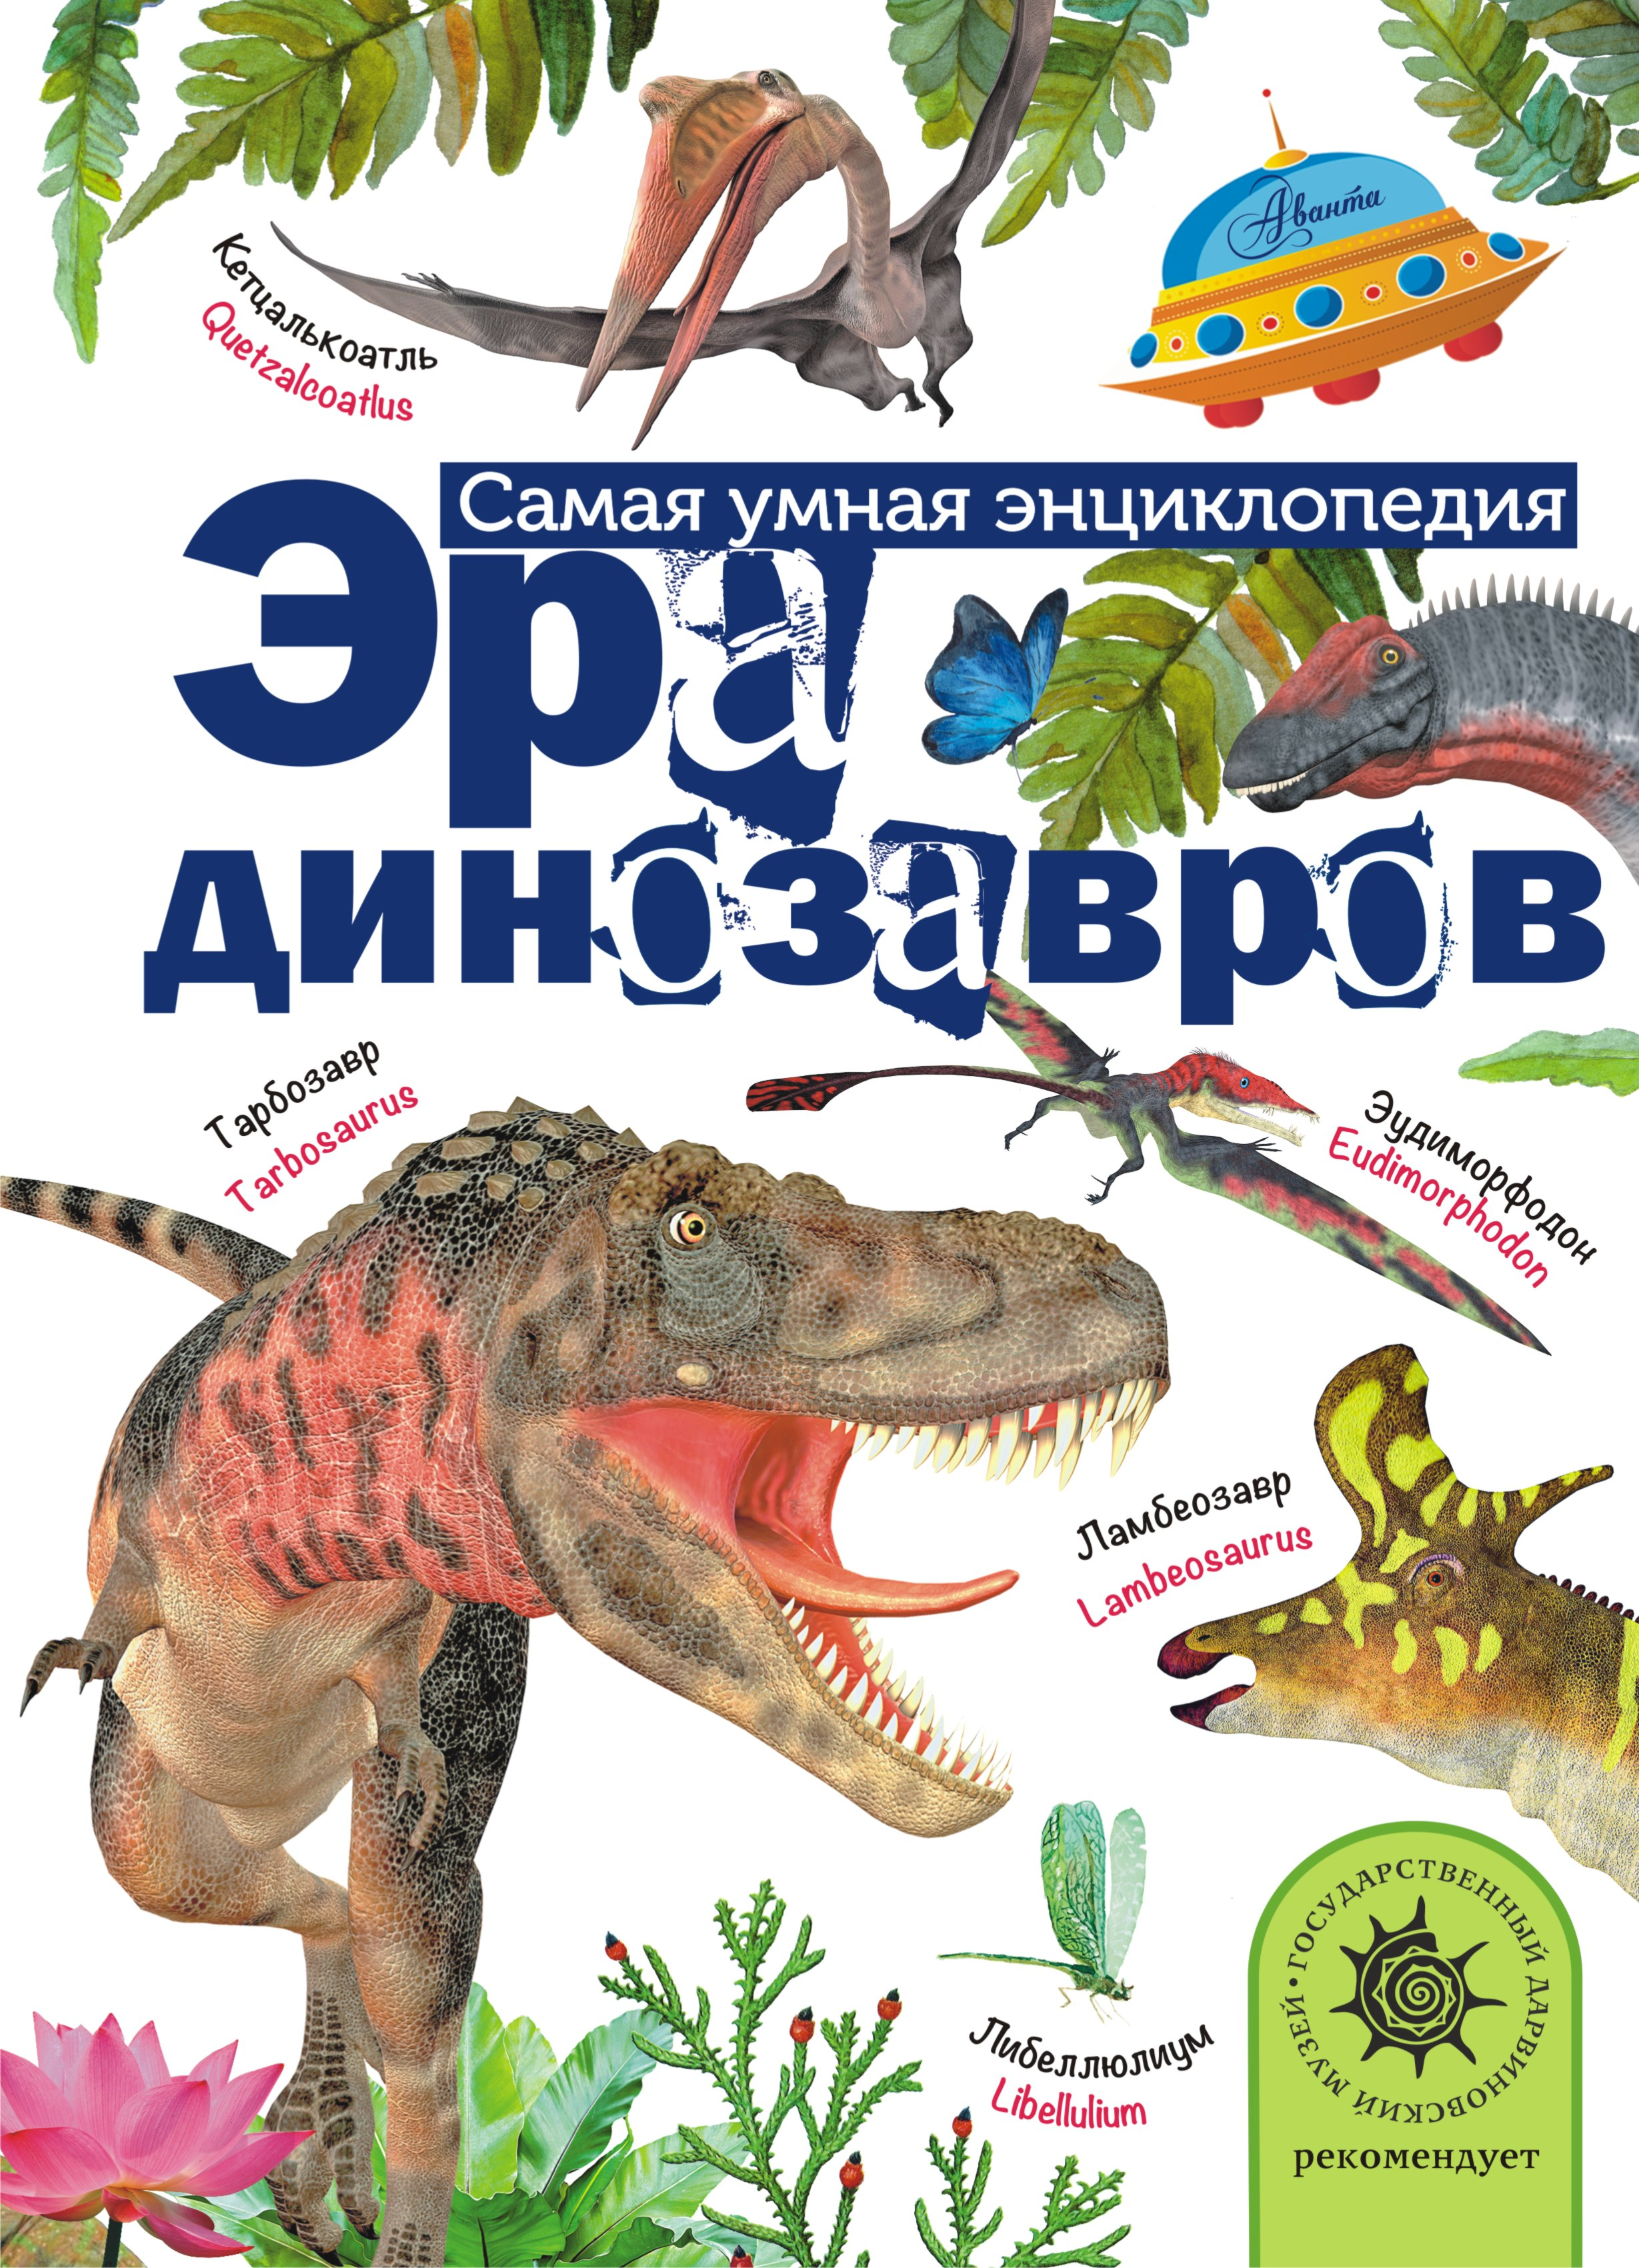 Александр Васильевич Тихонов Эра динозавров